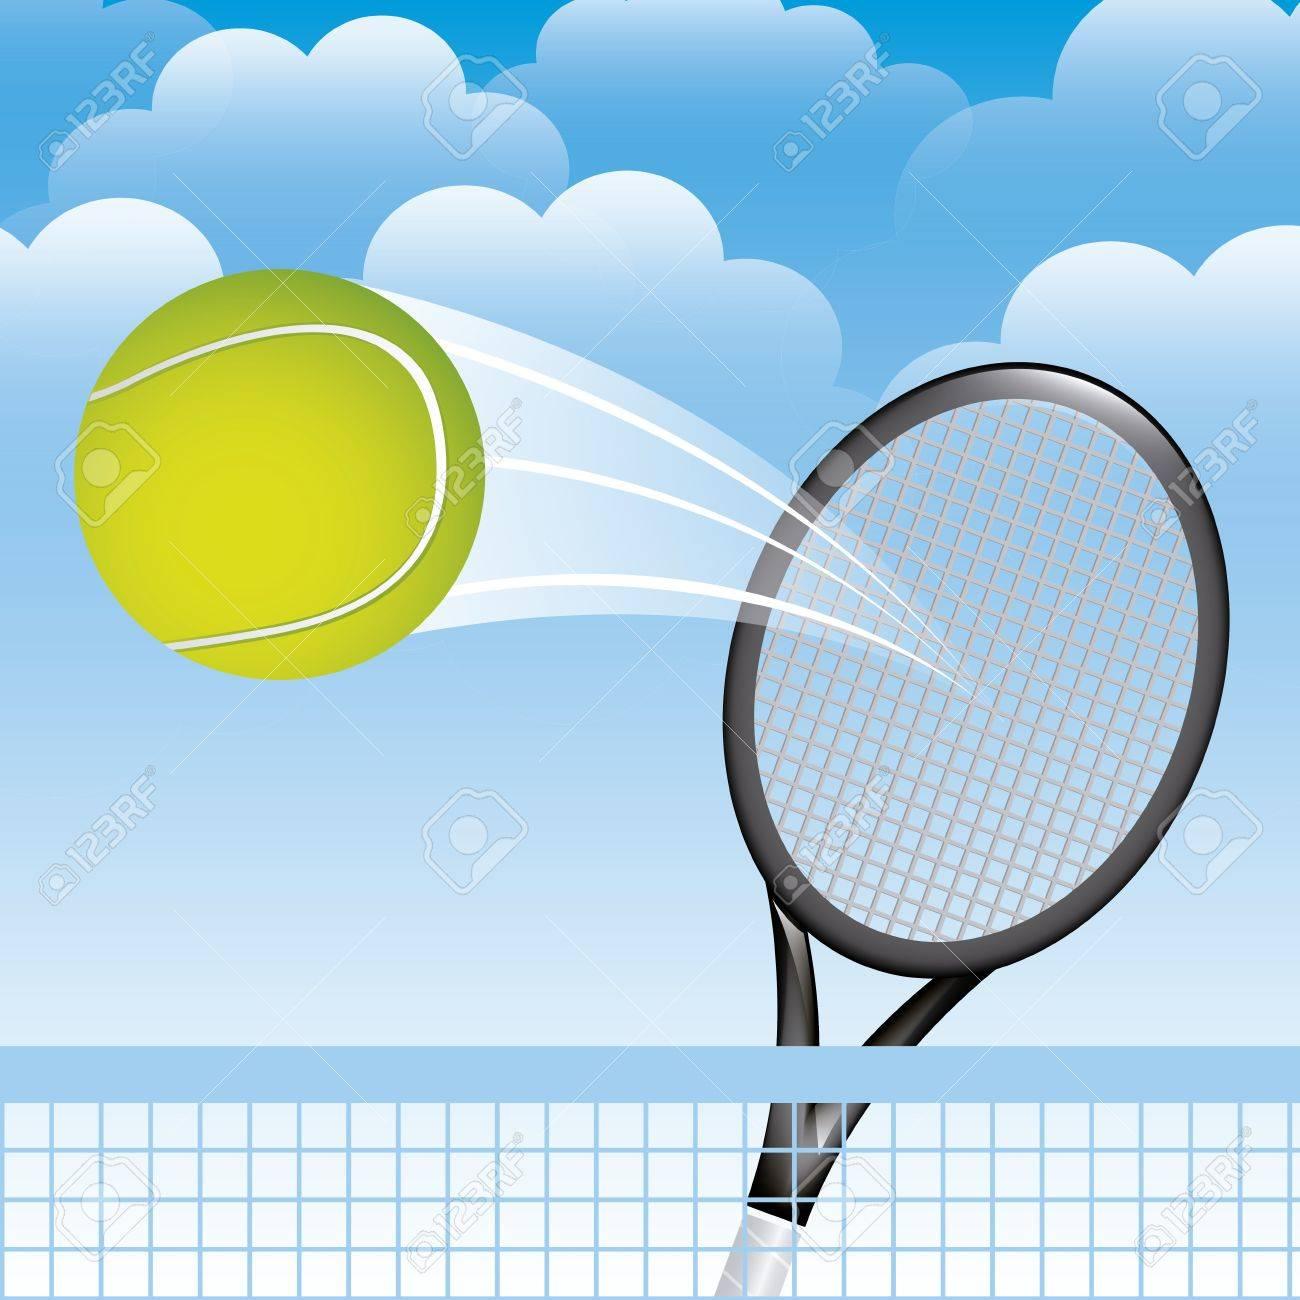 tennis landscape over sky background illustration Stock Vector - 19772948